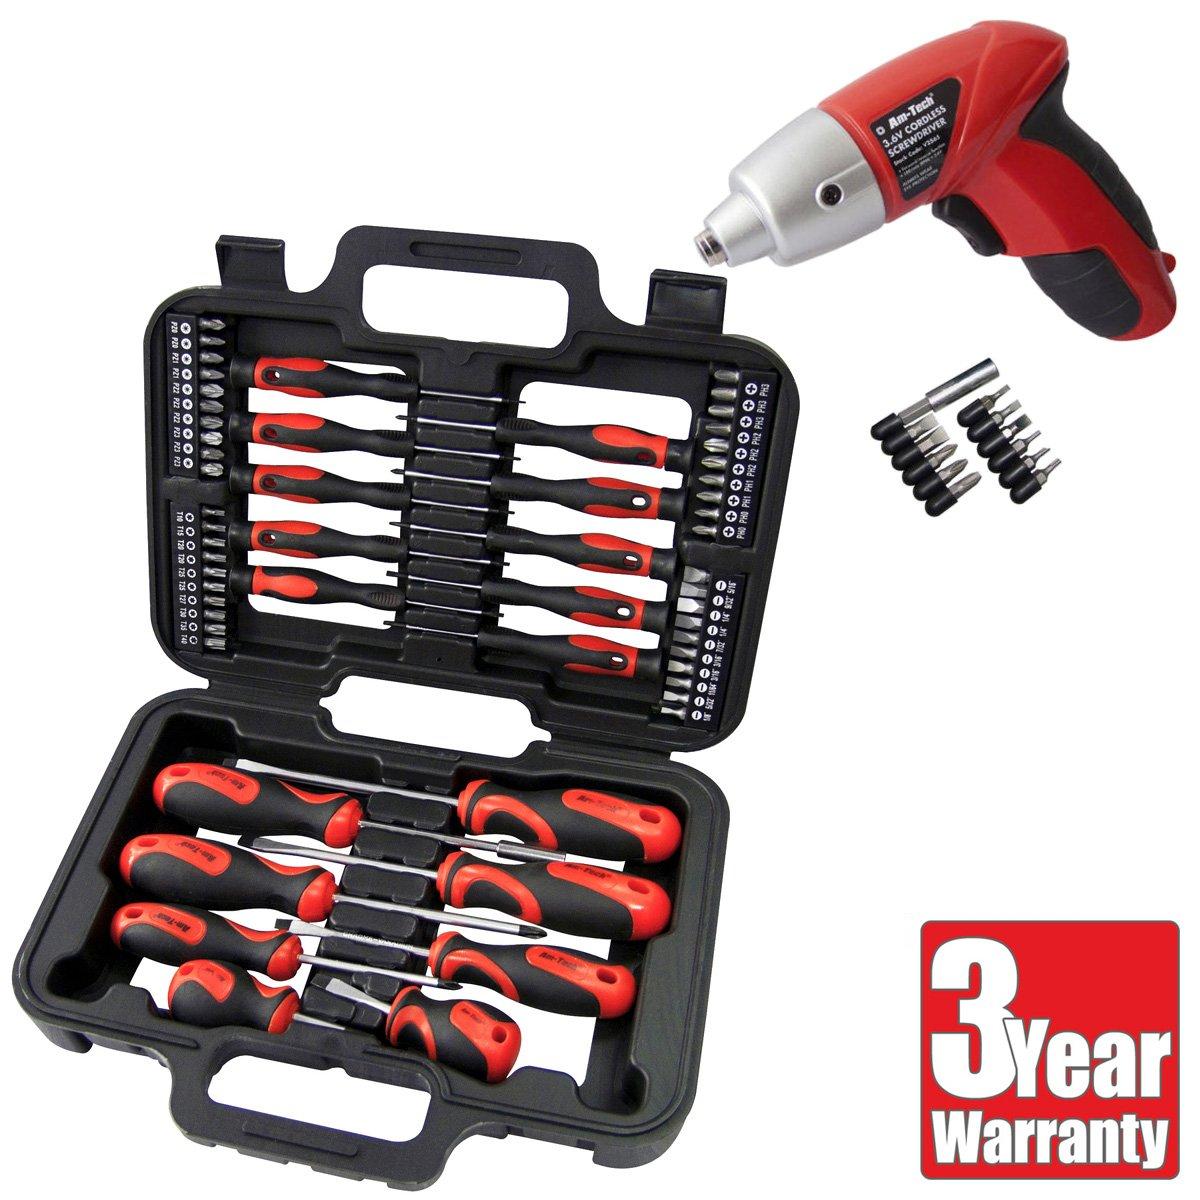 36v Rechargeable Electric Set Amtech 3.6v Cordless Screwdriver Kit